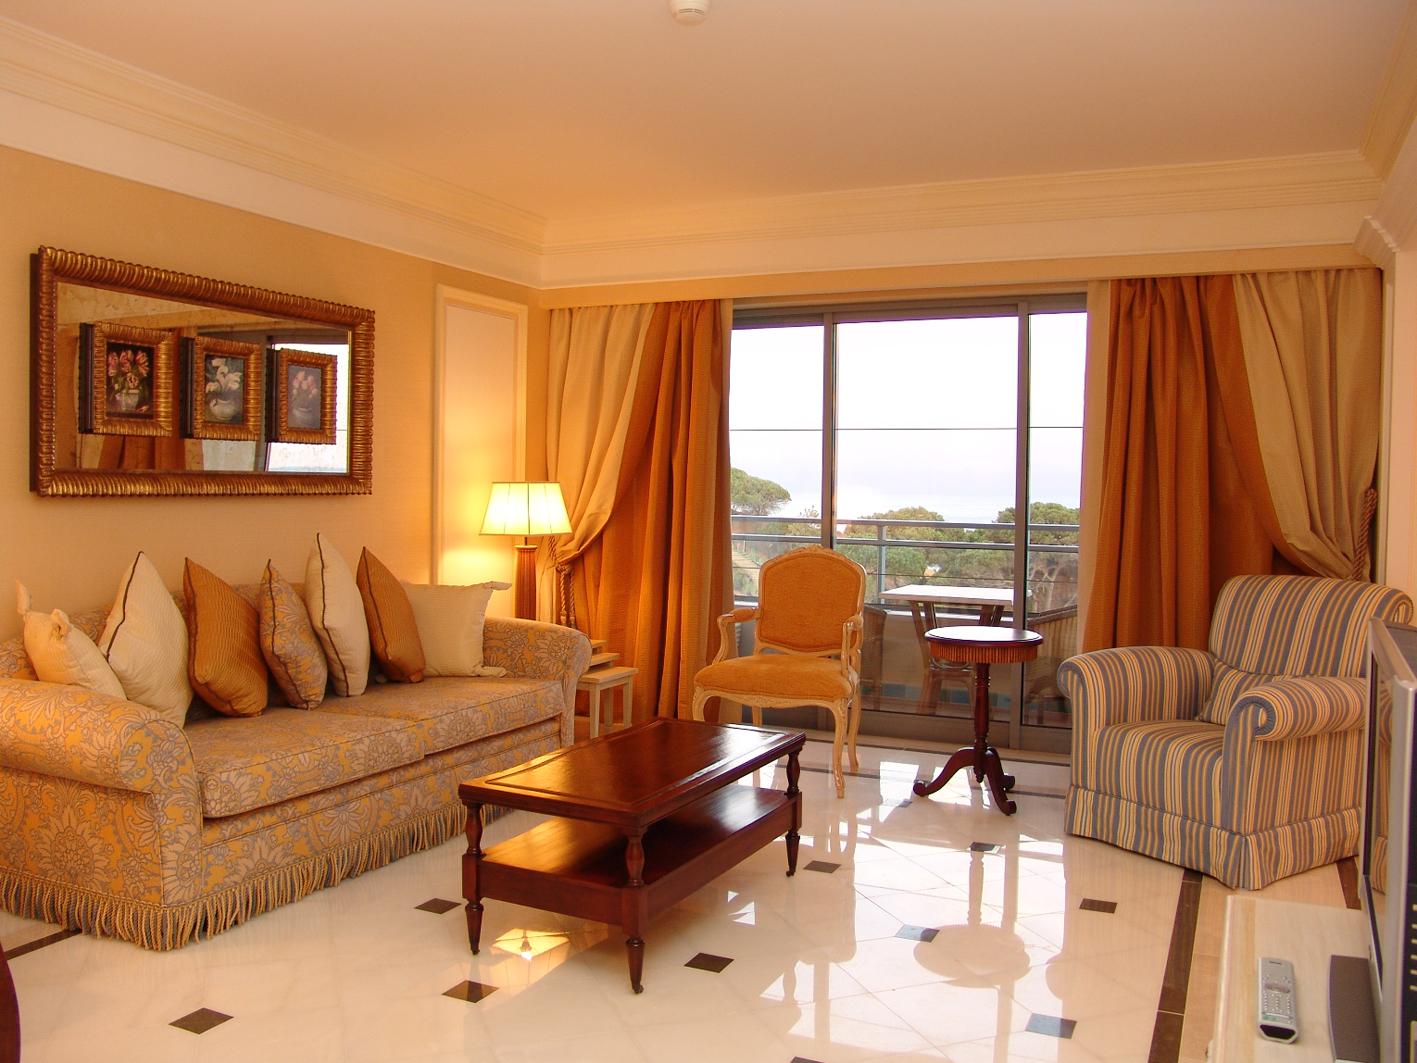 Contoh gambar ruang tamu rumah  Minimalist id com